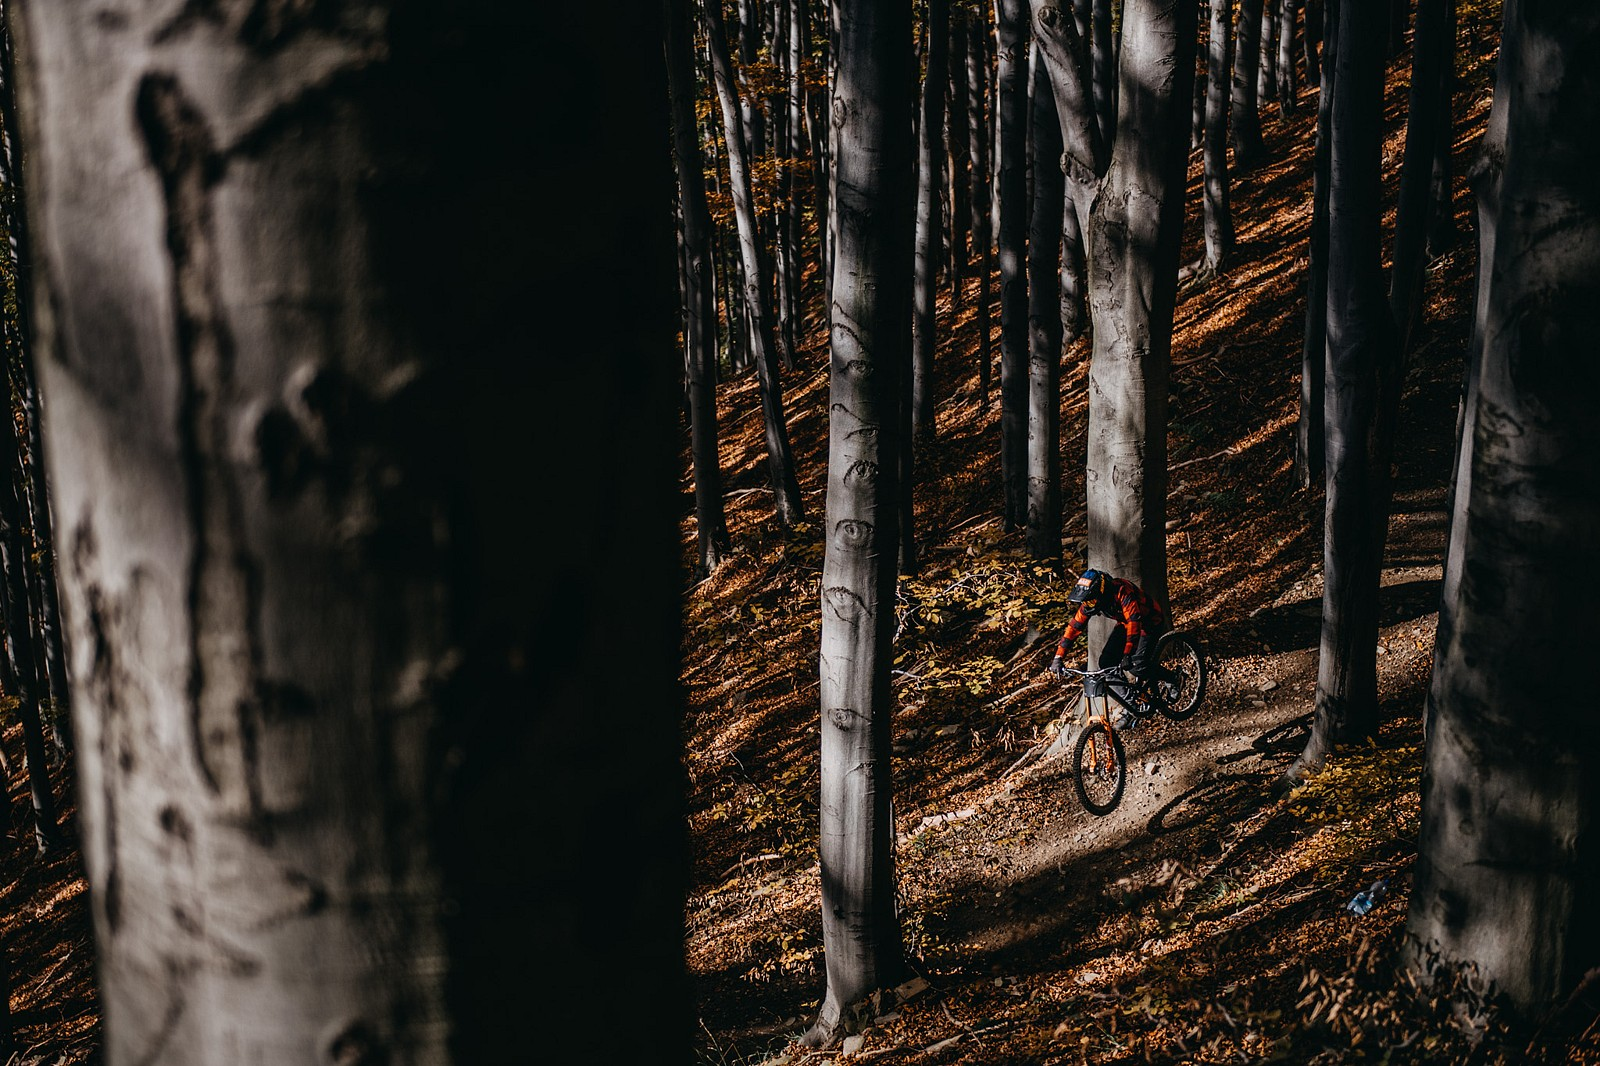 750EA322-7BDD-48B9-8300-E5ED4DC1B9C1 - Arczii95 - Mountain Biking Pictures - Vital MTB